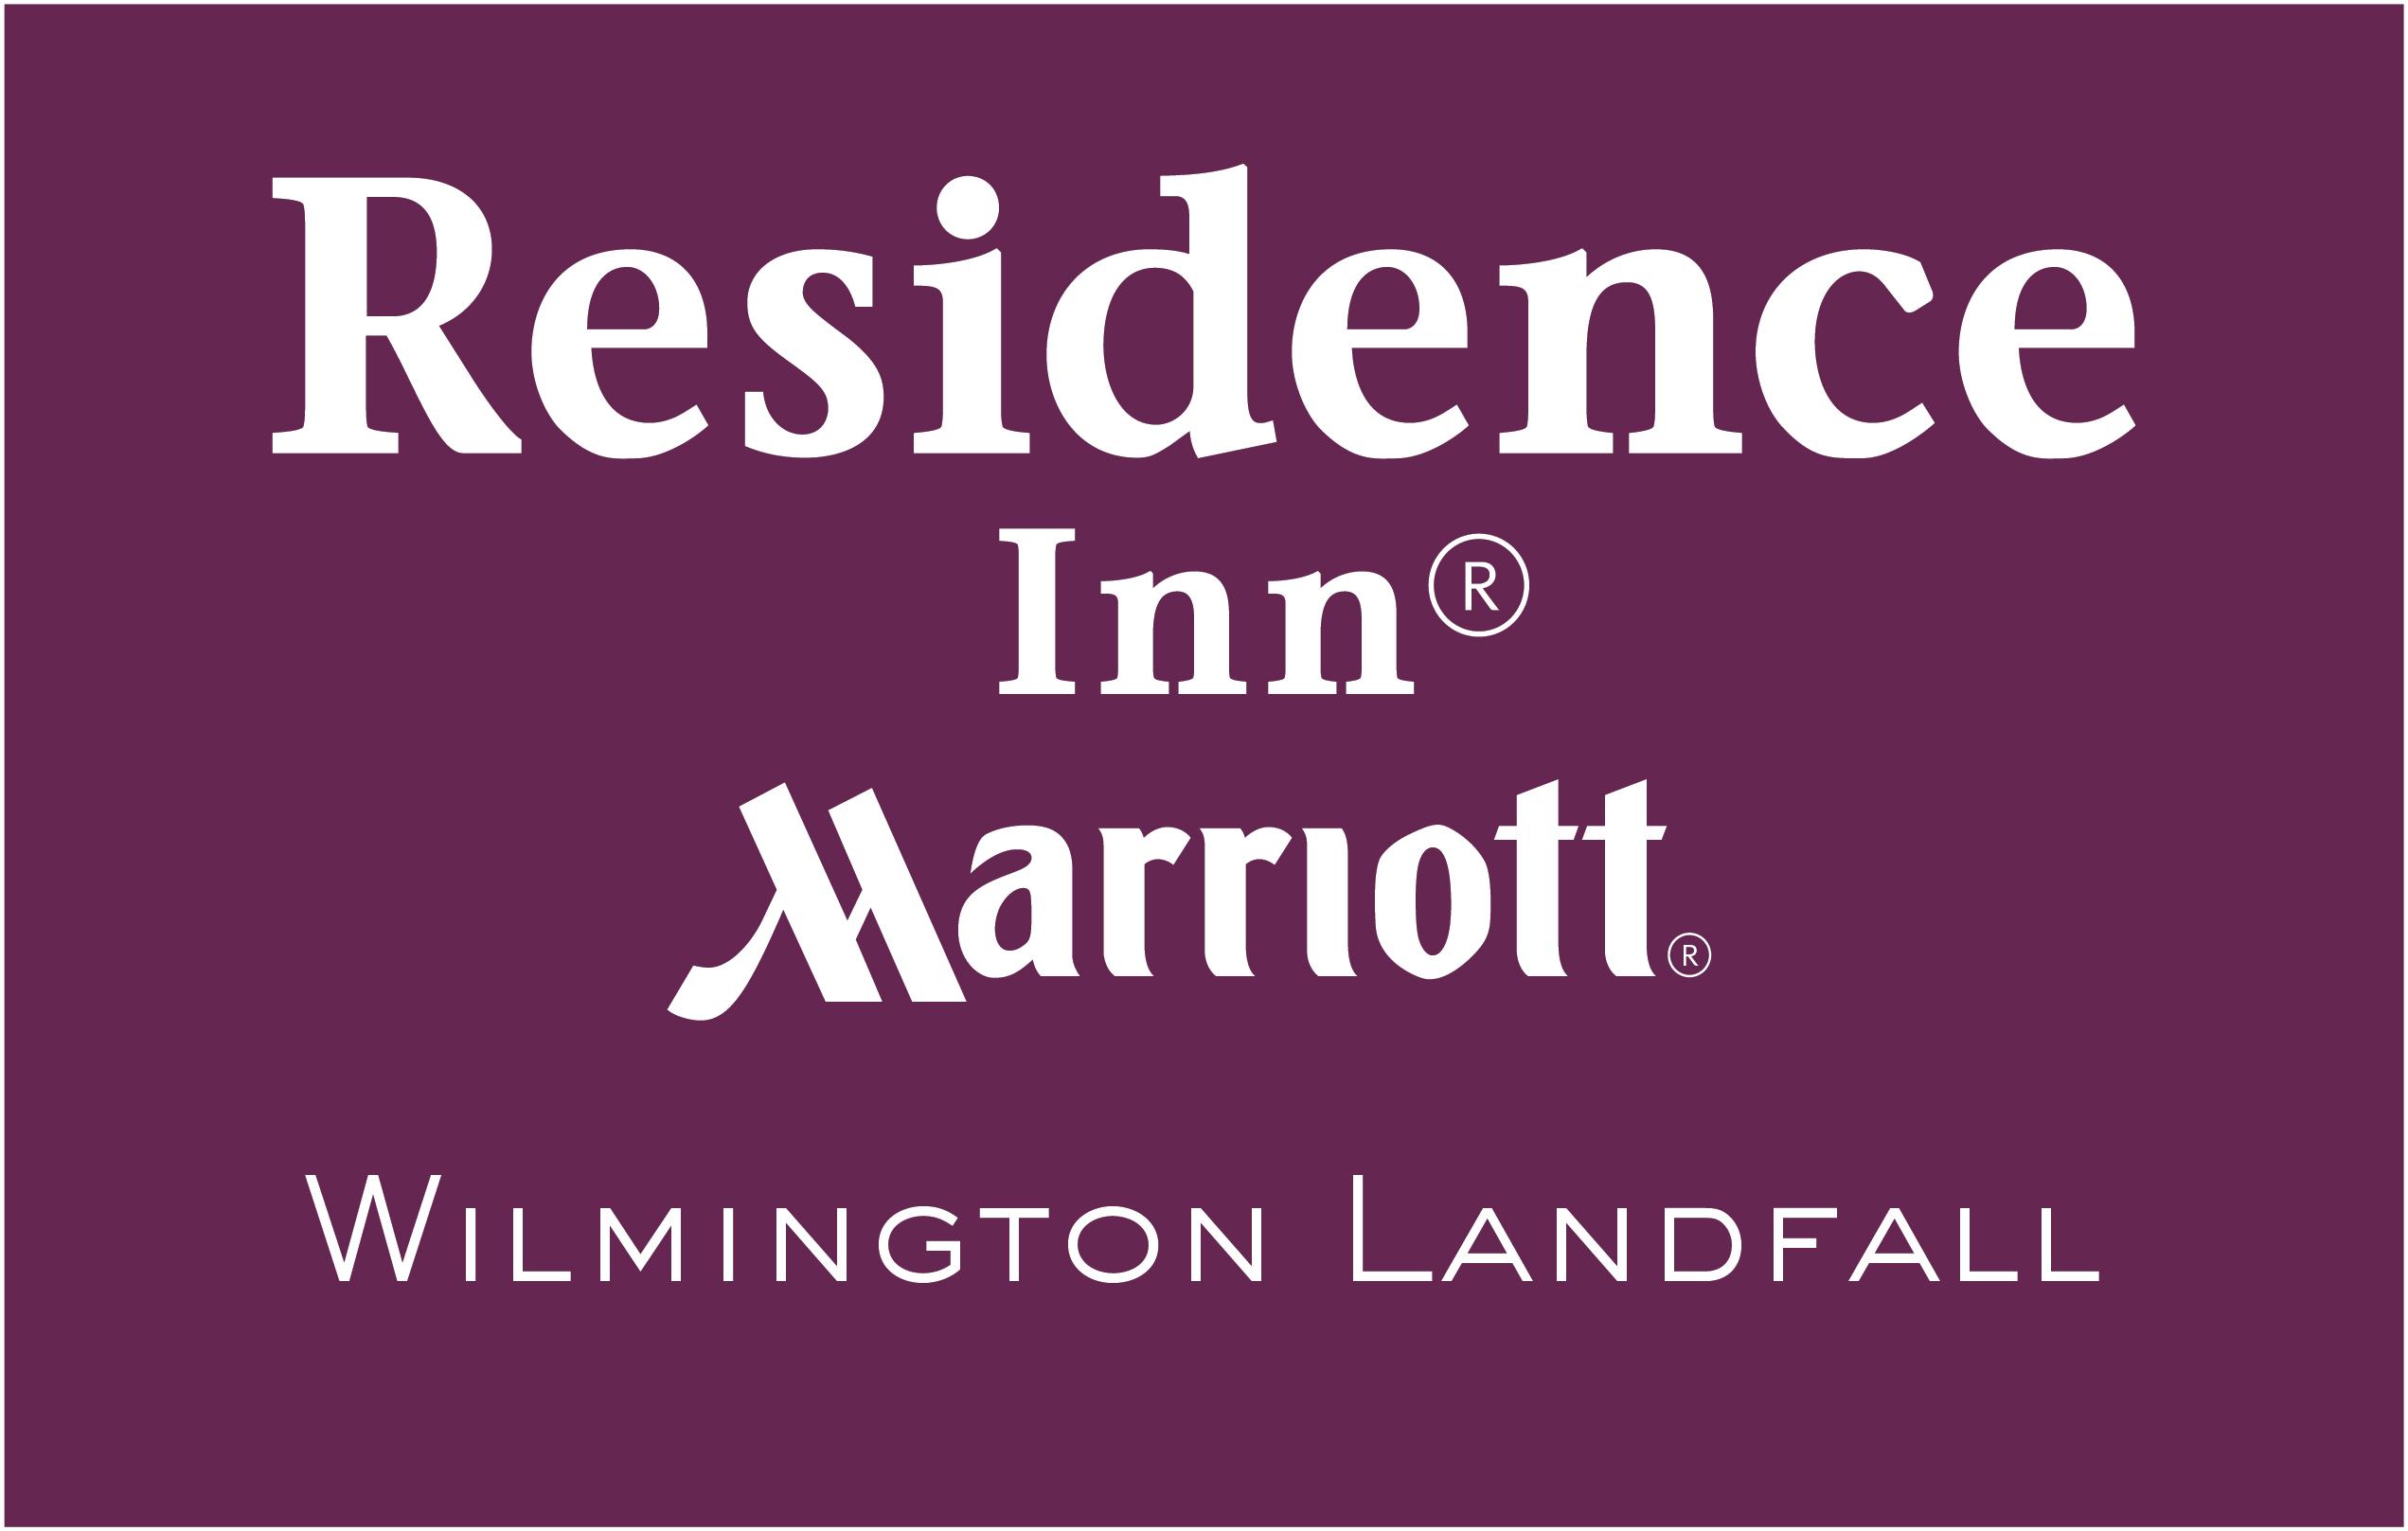 Residence Inn Marriott Landfall copy